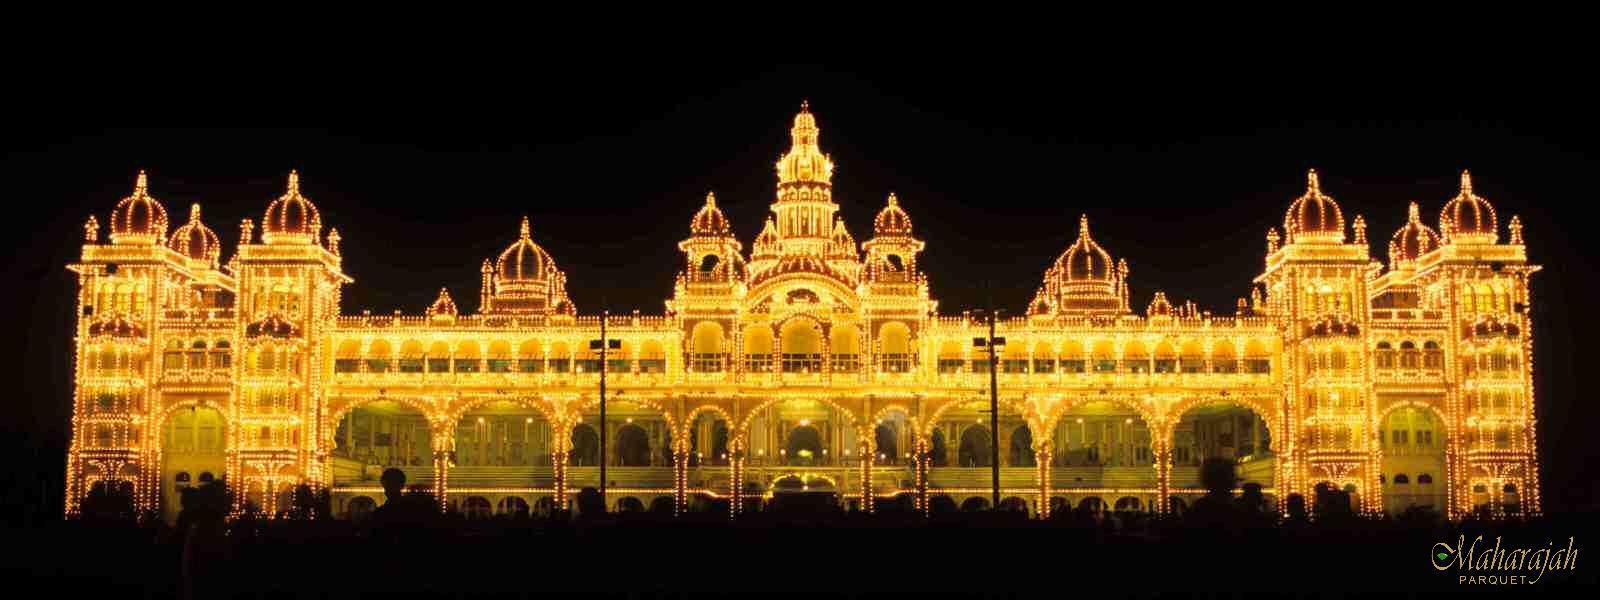 palace-night